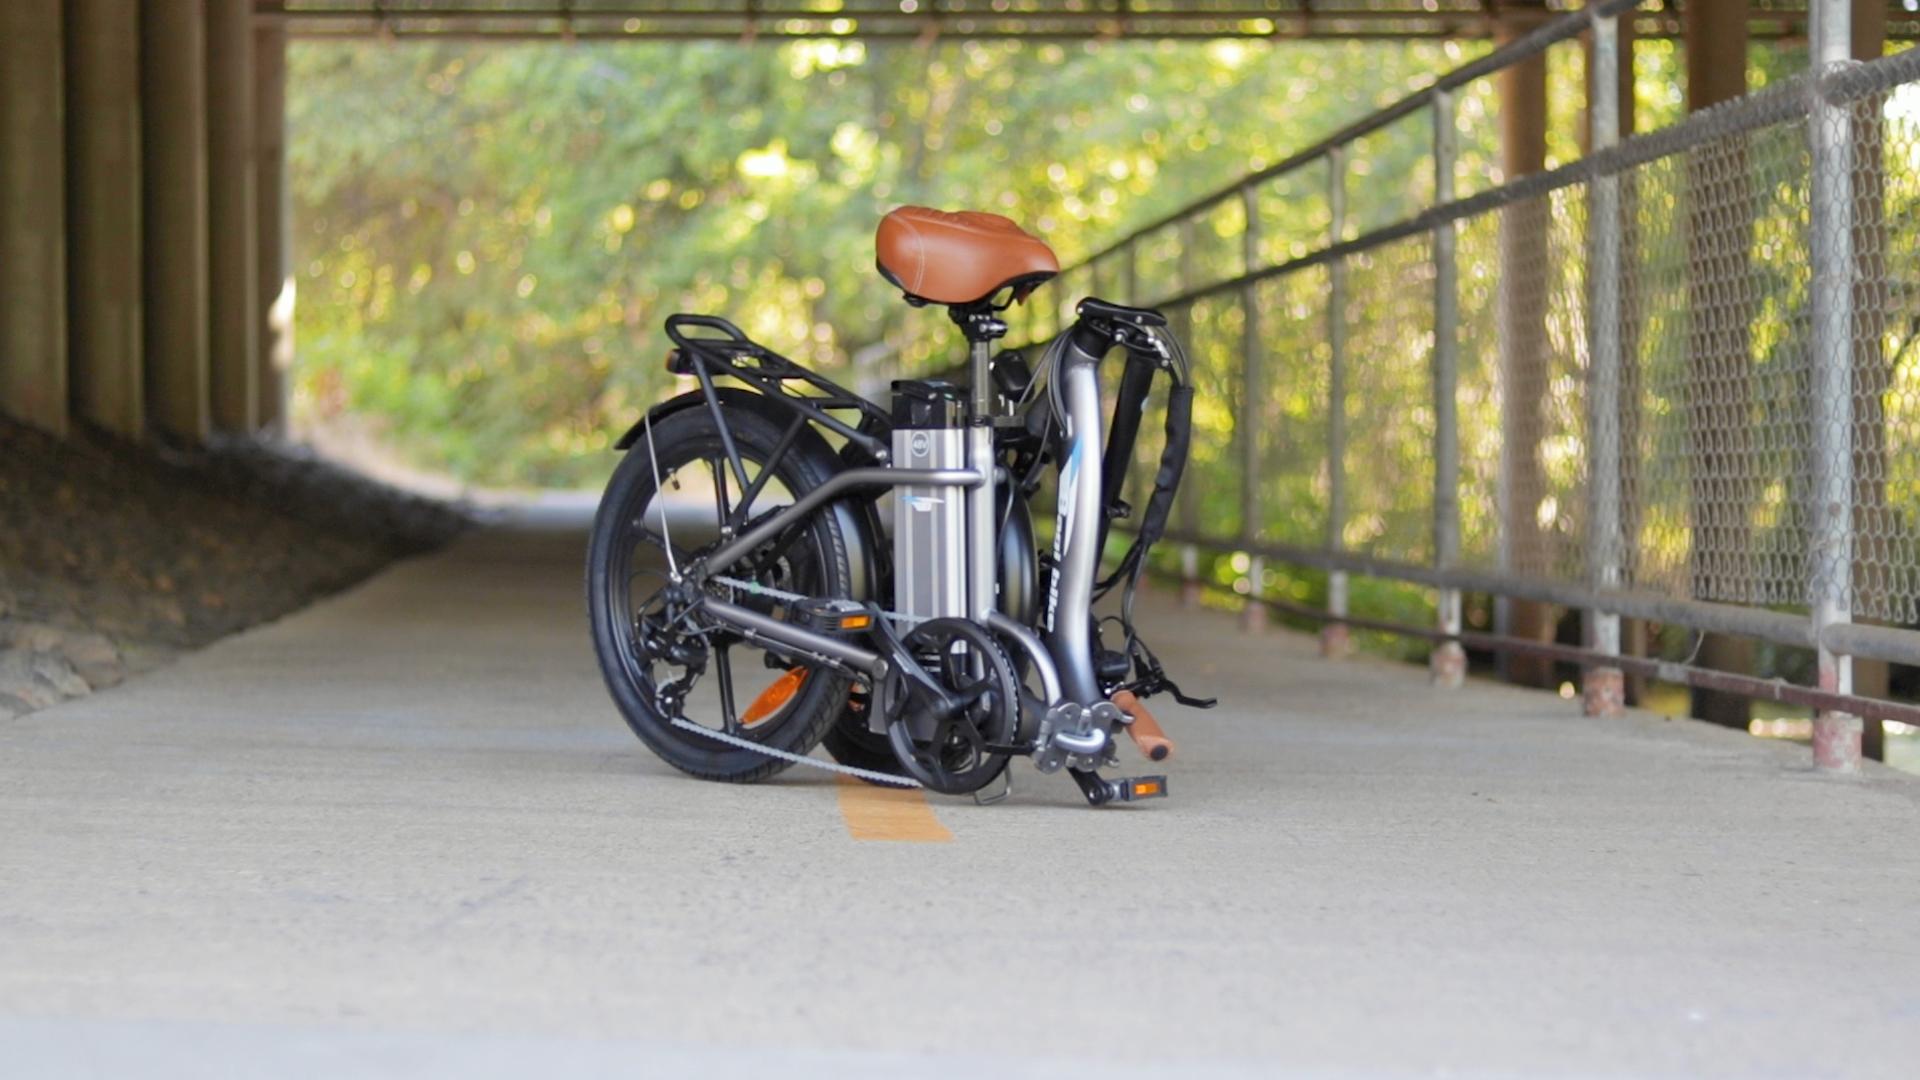 electrified-reviews-bagibike-b10-foldign-electric-bike-review-folded-3.jpg